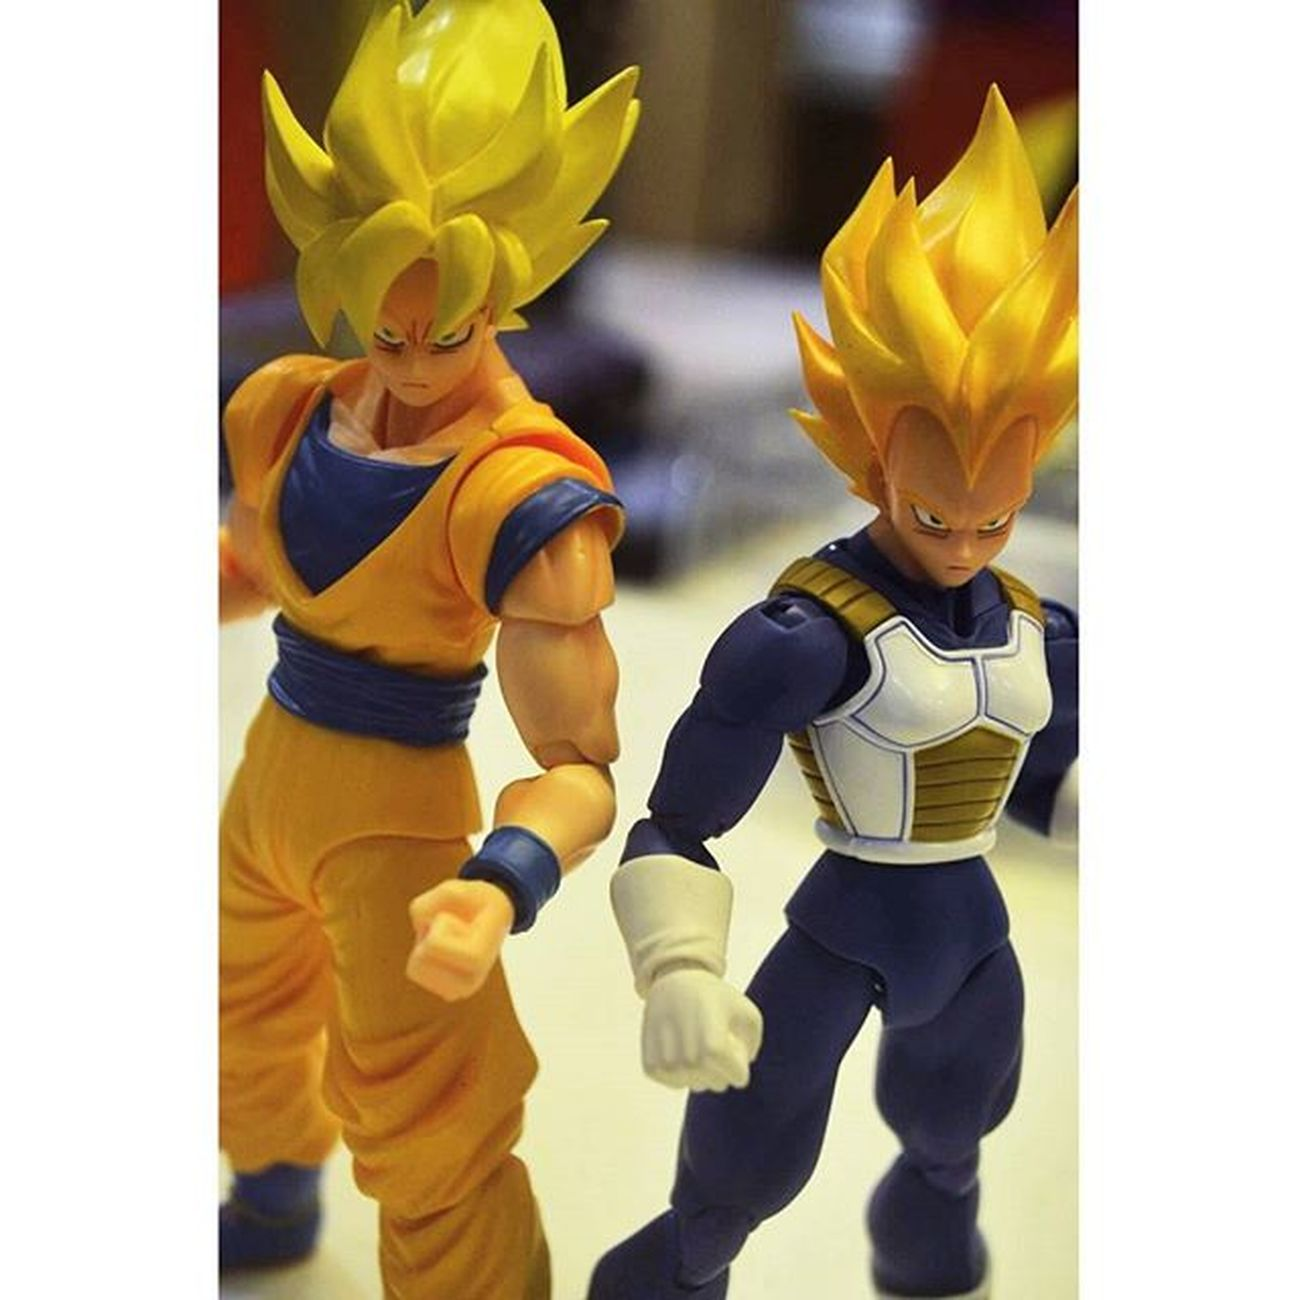 Night out with the saiyans Shf Shf_ph Dragonballz Supersaiyan Goku Vegeta